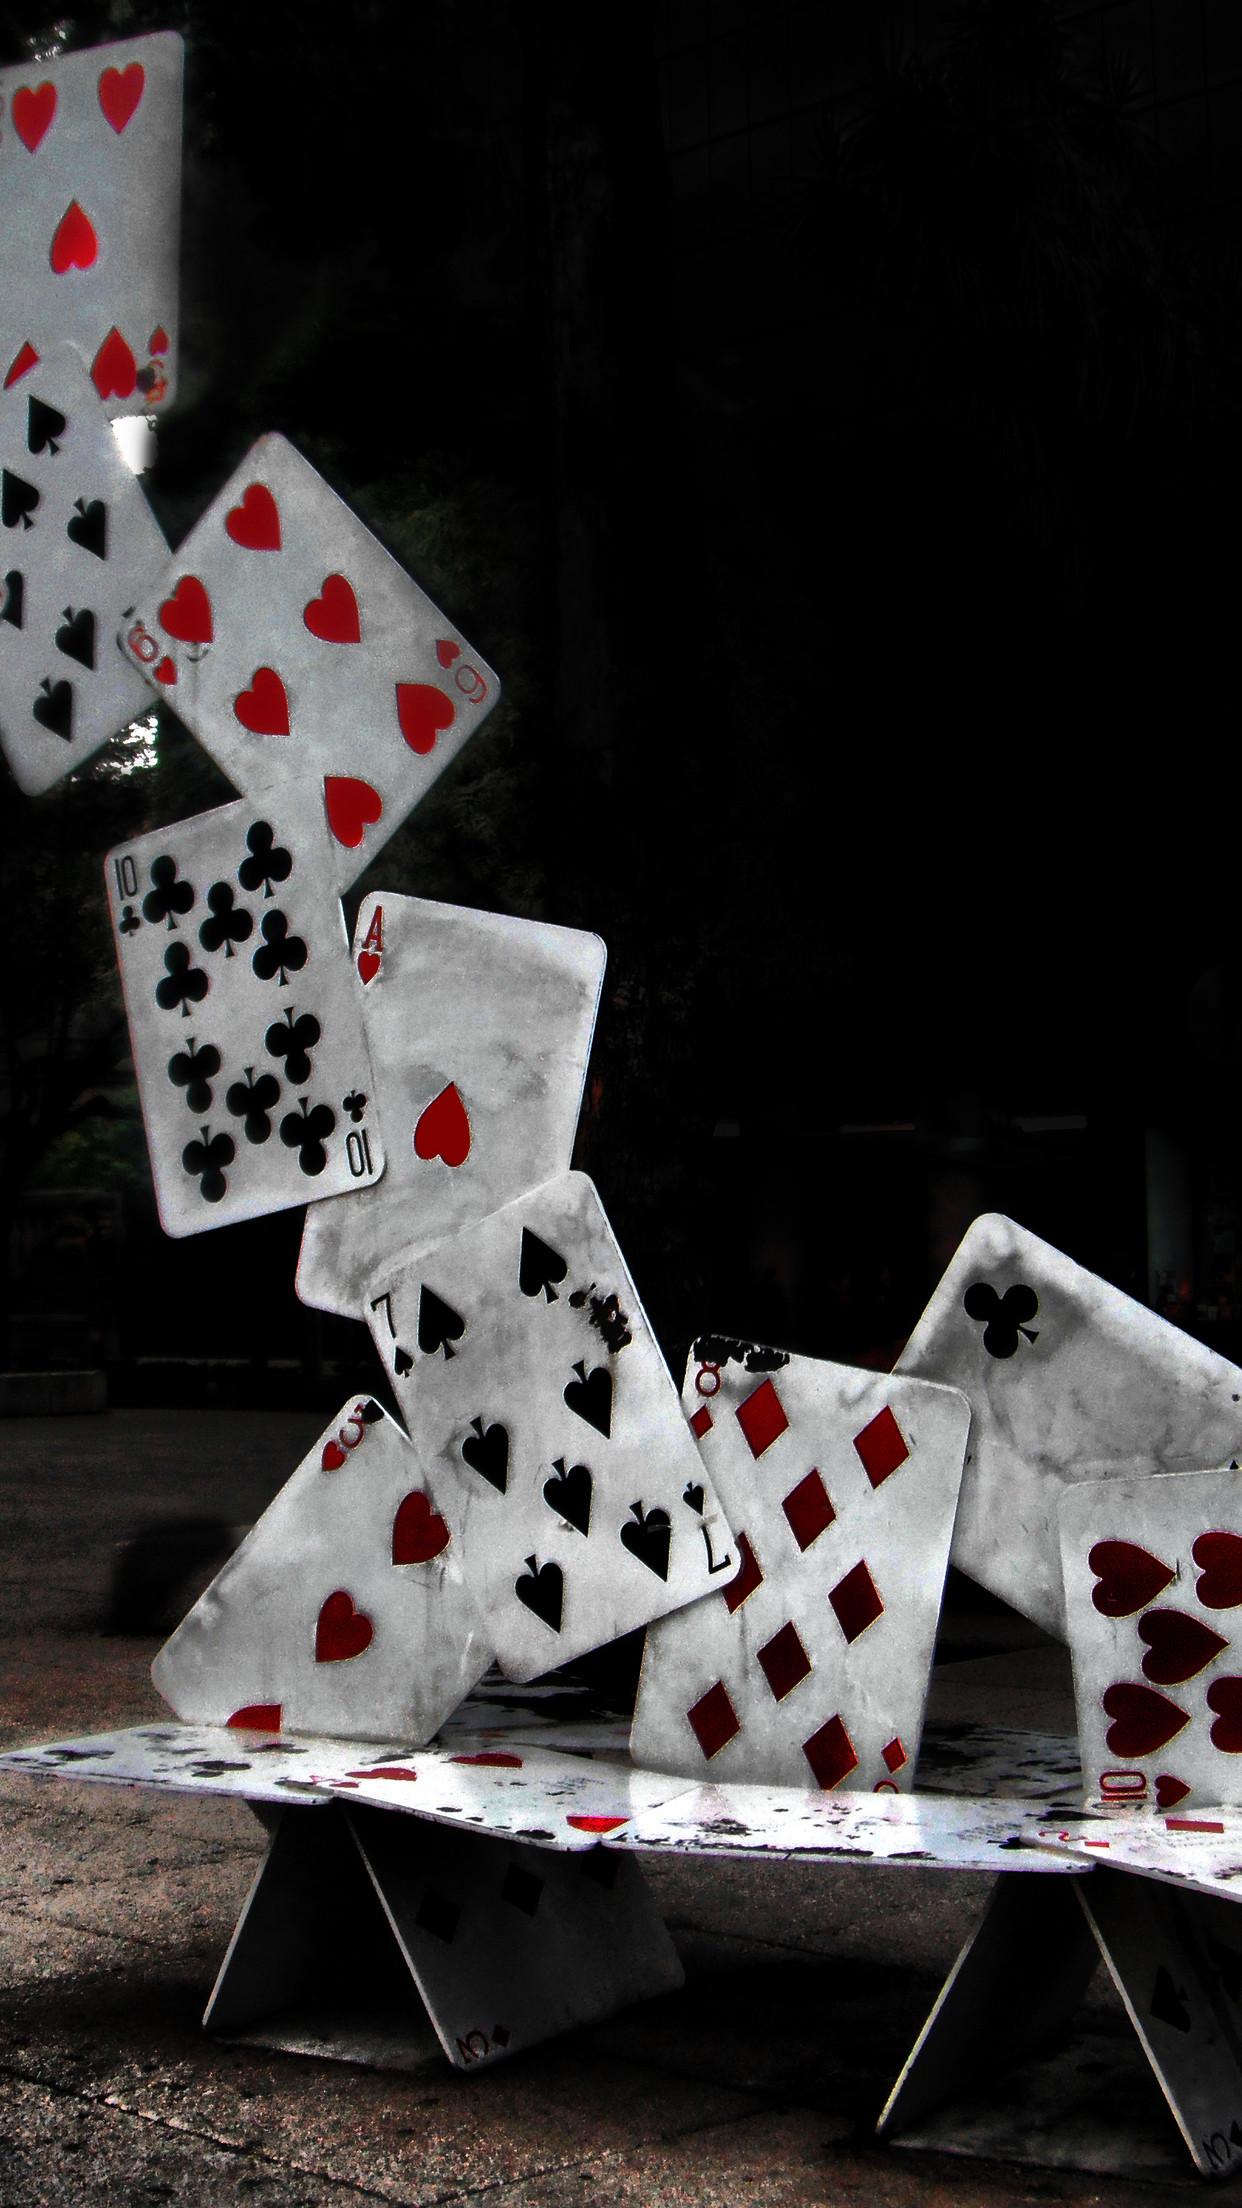 Poker Wallpaper Iphone 5